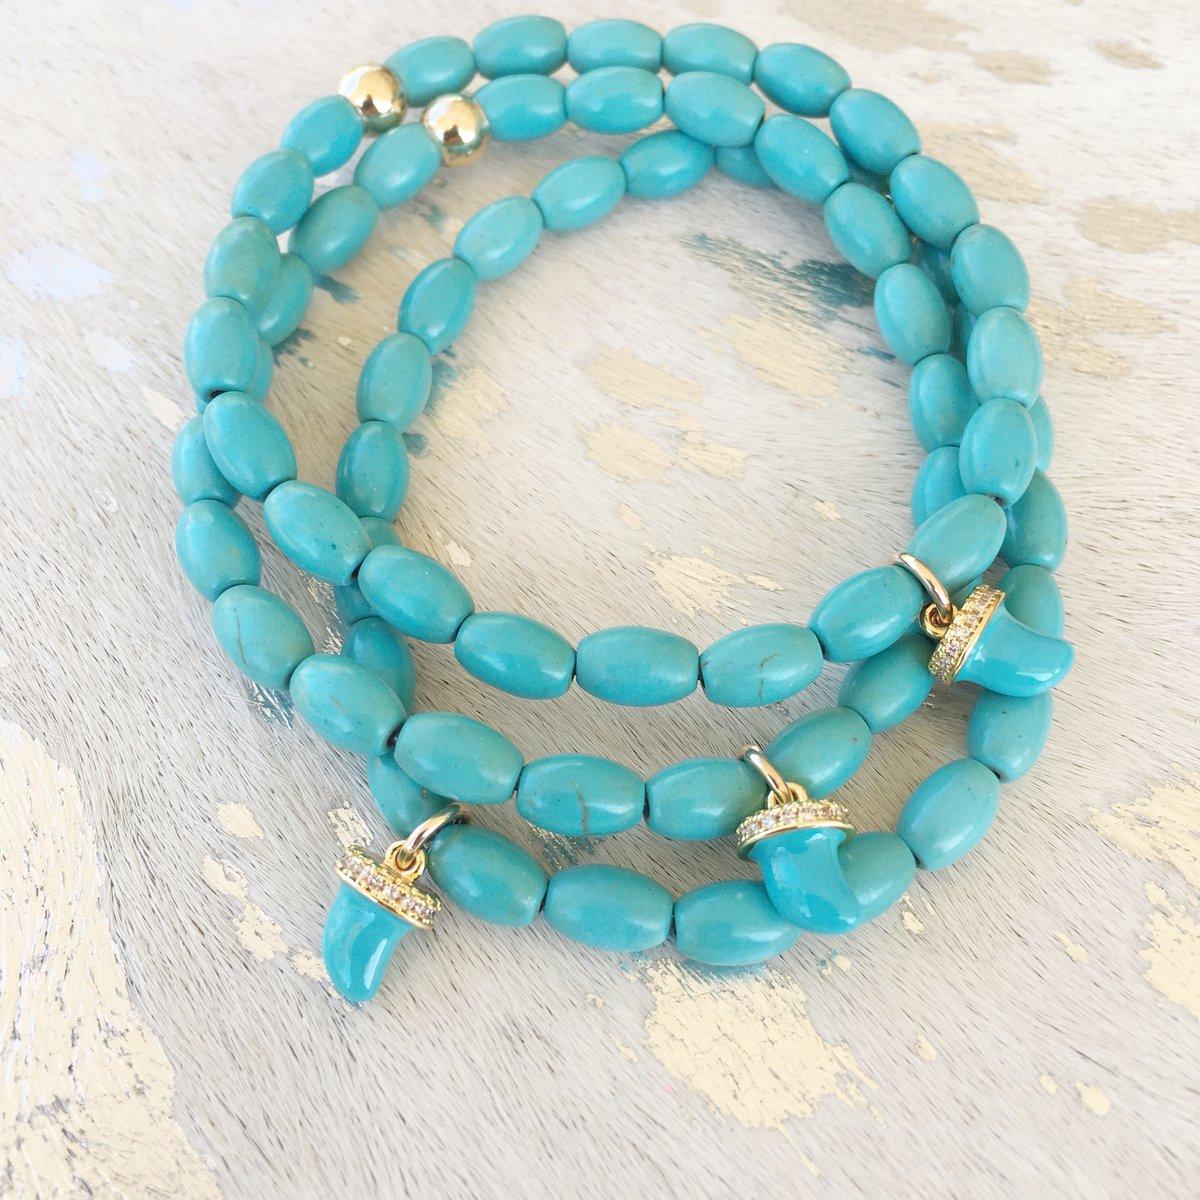 TenThings. SEA LANE. Turquoise. Horn. Bracelet. B-SL